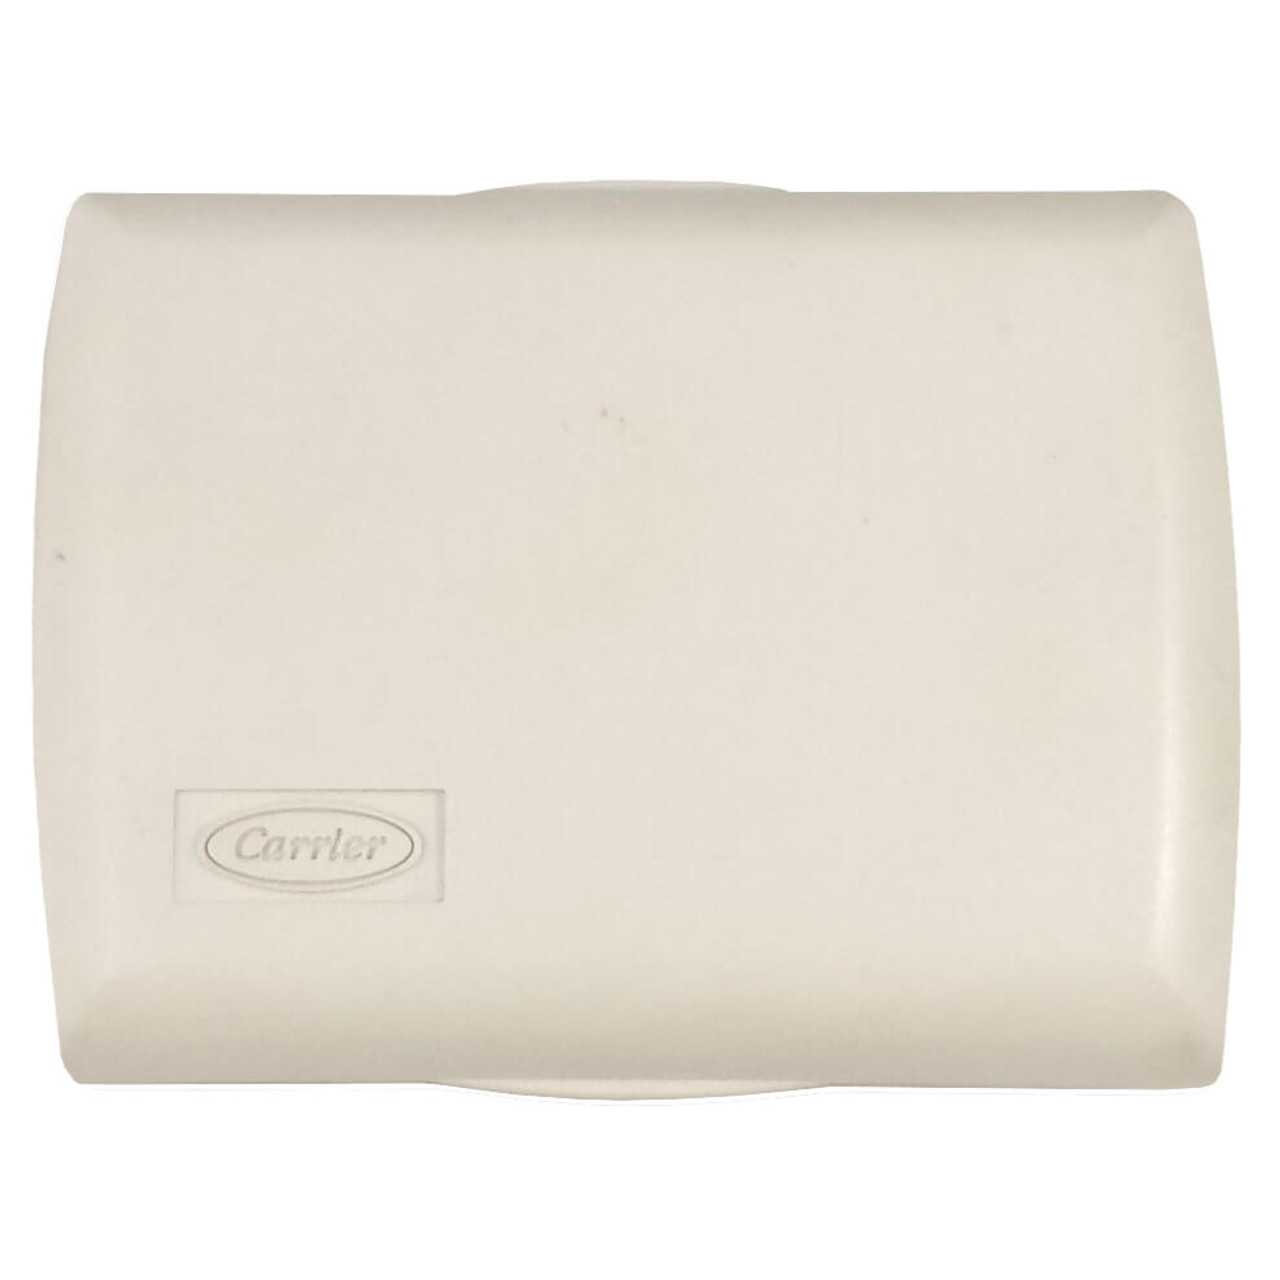 ZONECC0SMS01 - Smart Sensor Thermostat